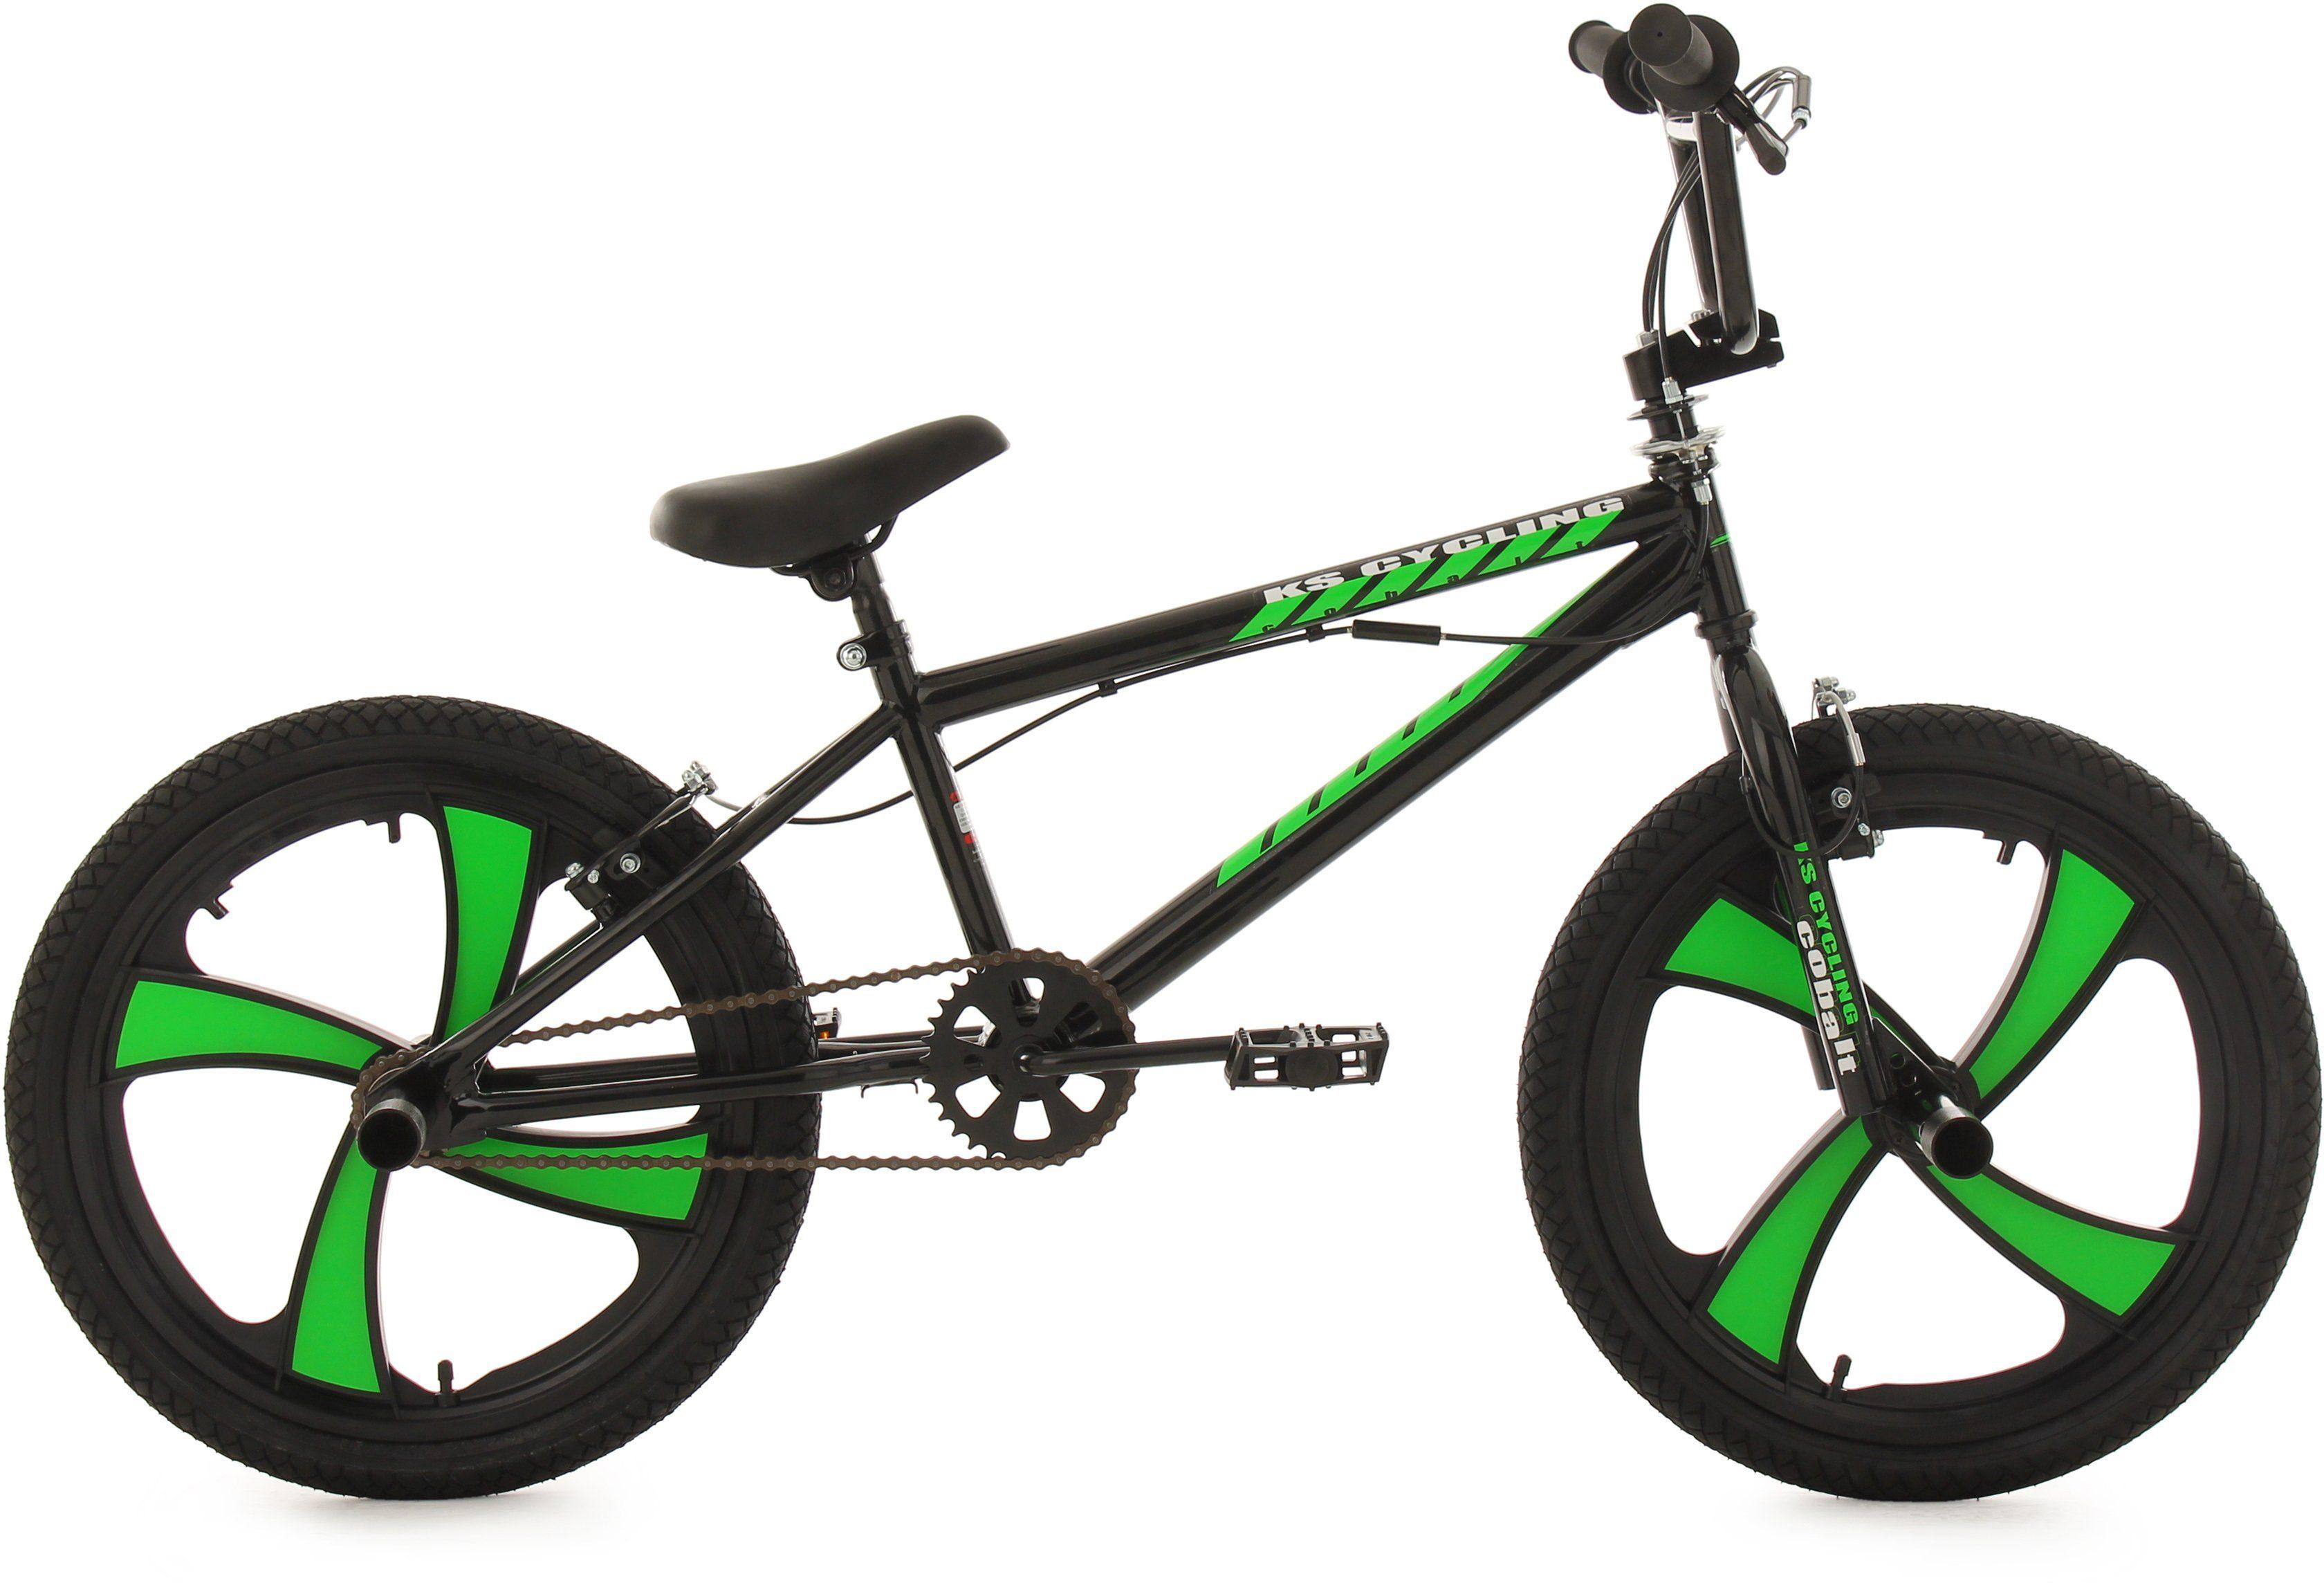 KS Cycling BMX Fahrrad, 20 Zoll, schwarz-grün, »Cobalt«